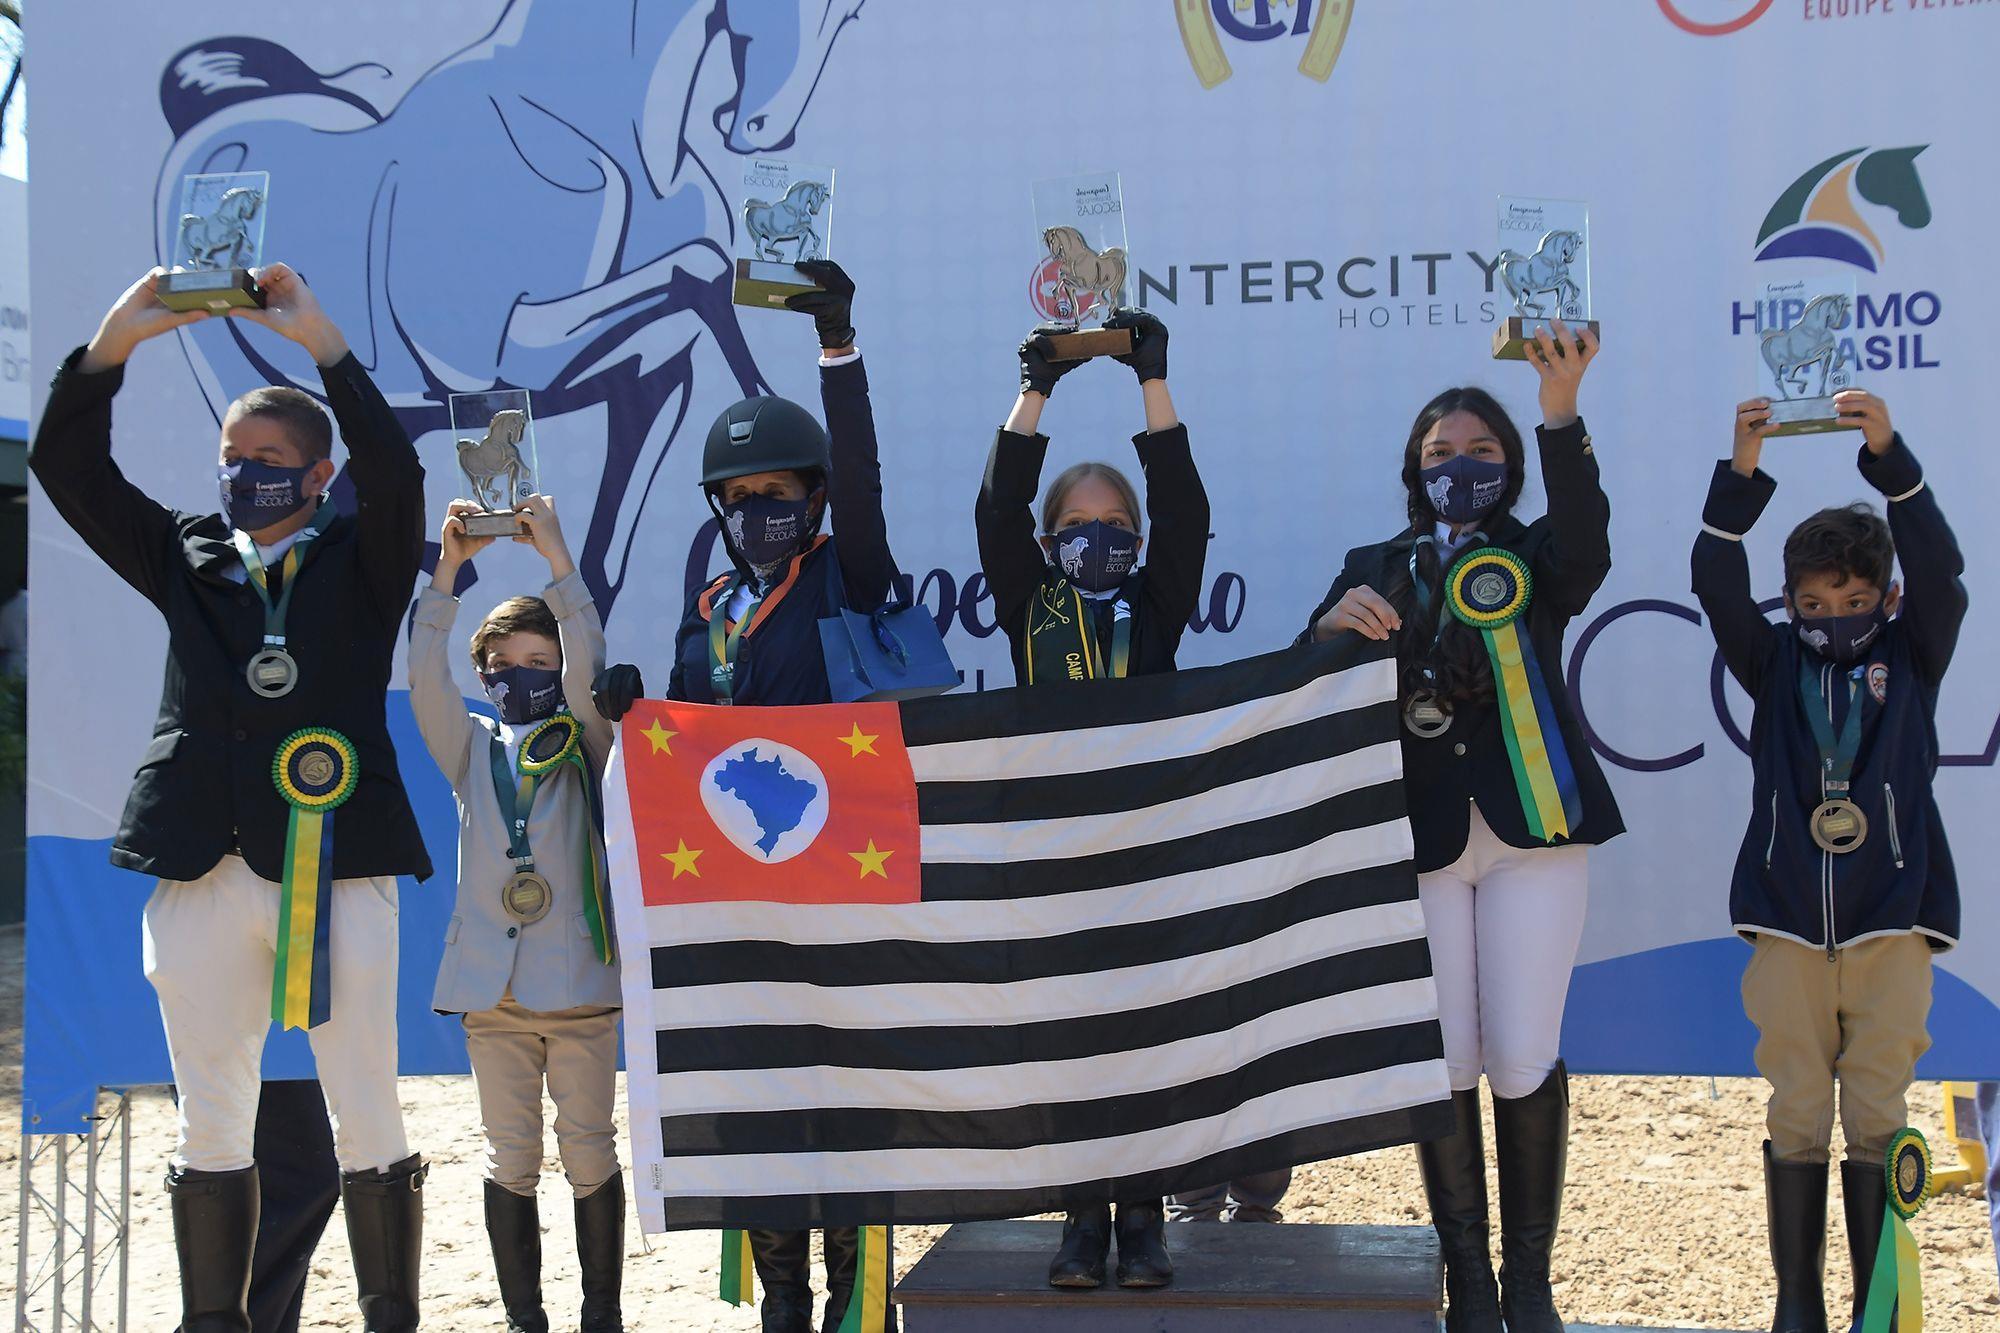 Vencedores da categoria Preliminar no Brasileiro de Escolas, Hipismo,  Clube Hípico Santo Amaro,  cavalos,  Revista Horse,  juventude, Tupa Vídeos, Brasileiro de Escolas define campeões